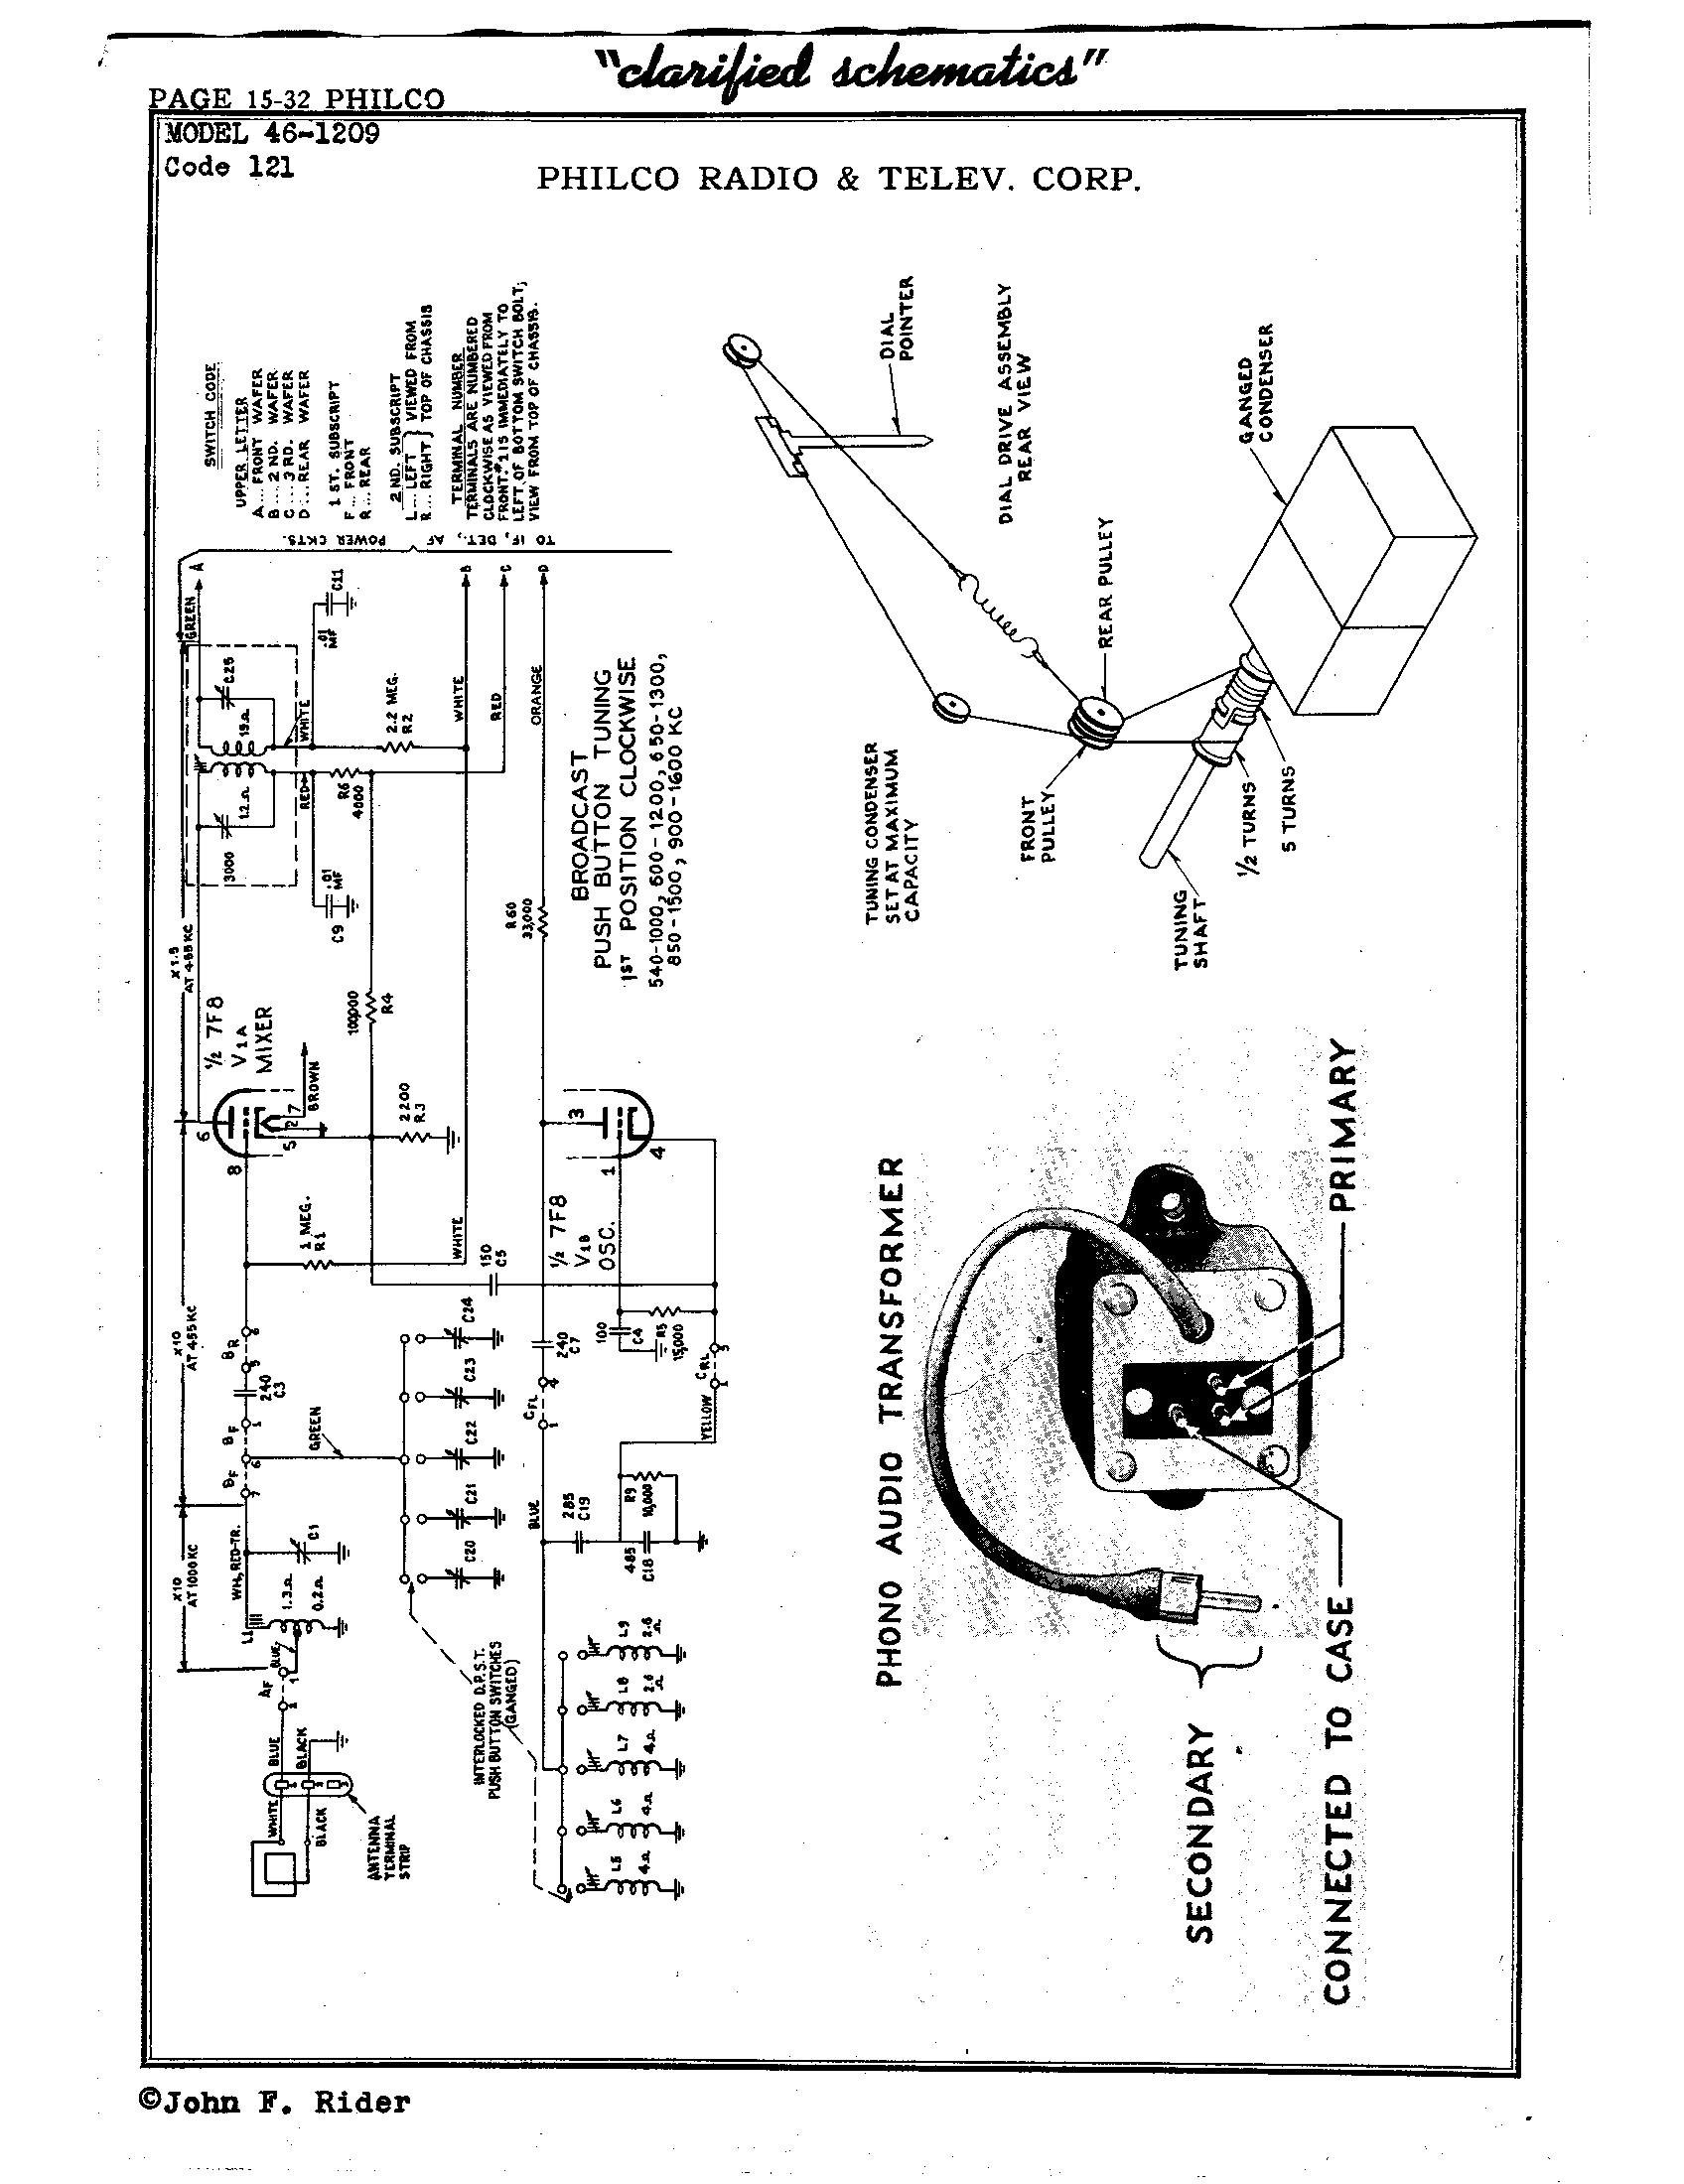 121 Kc Wiring Diagram - Schematic Diagrams